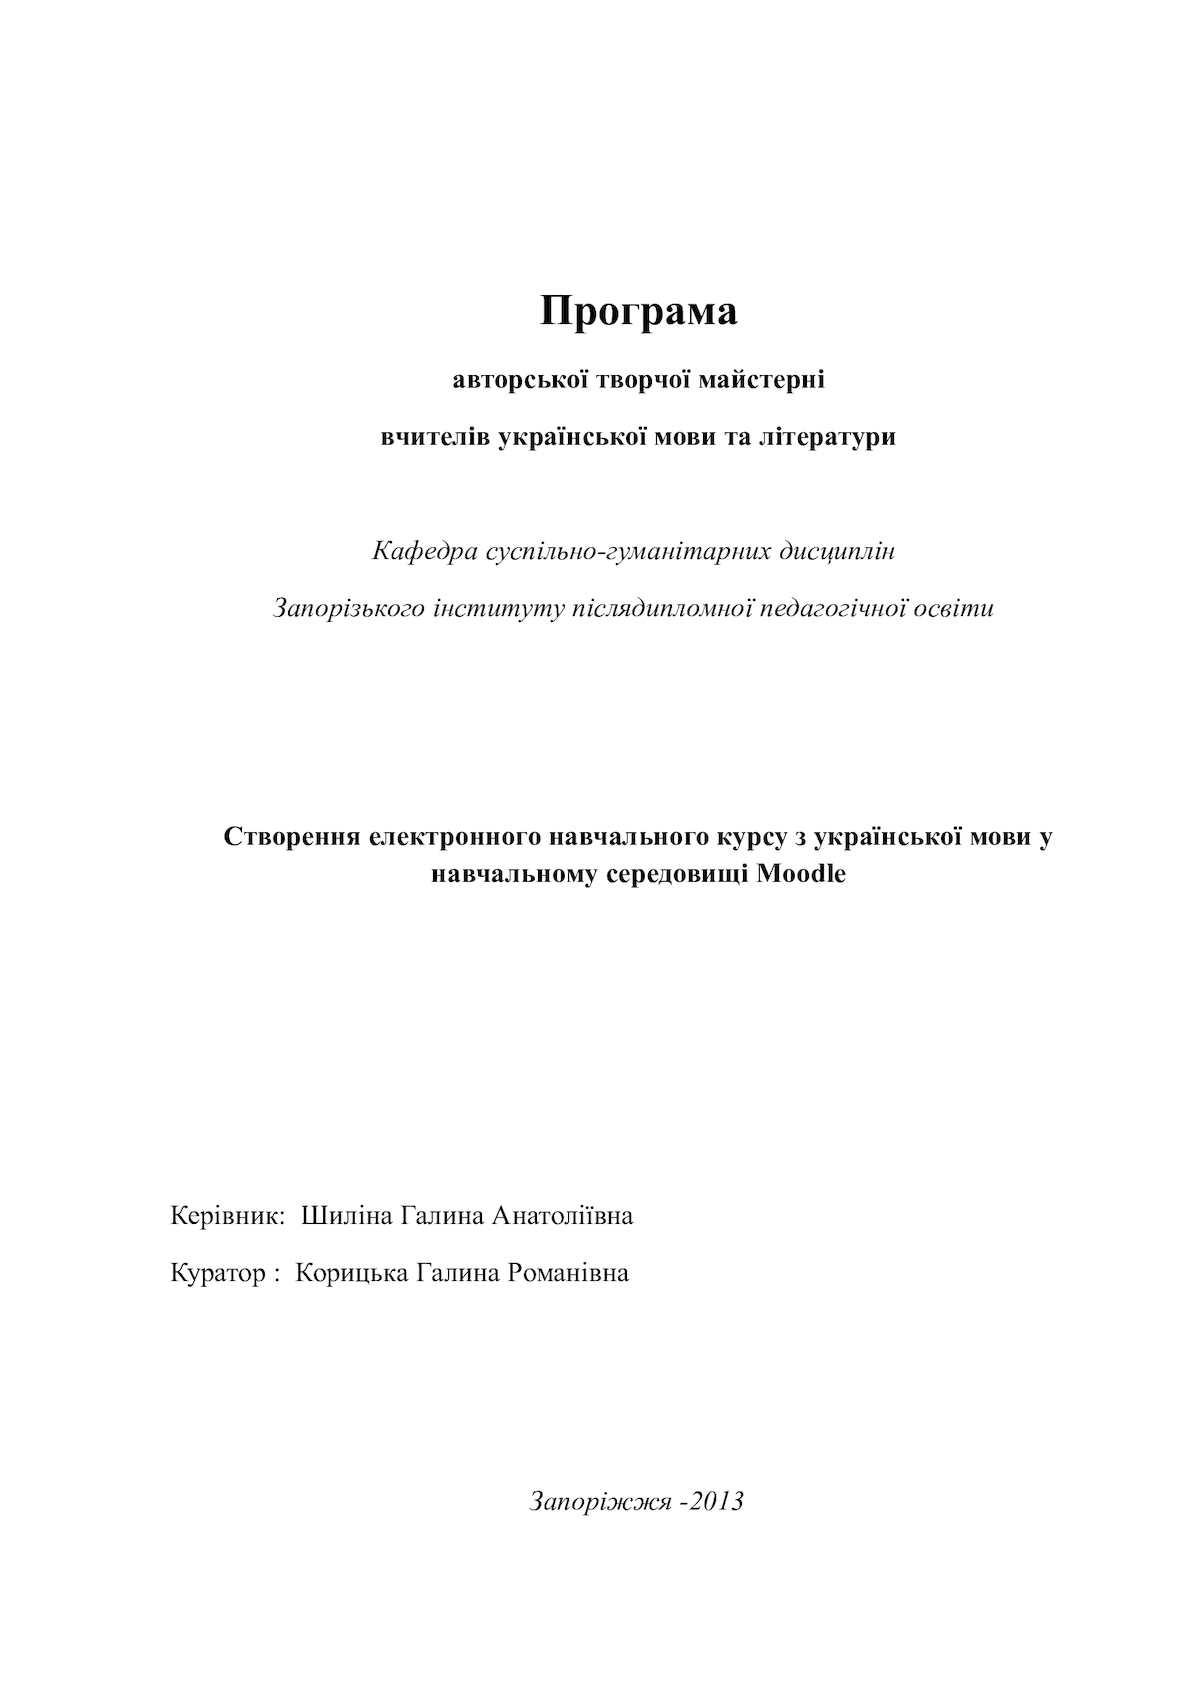 Calaméo - Програма майстернI ШилIна f676dfc8b0945